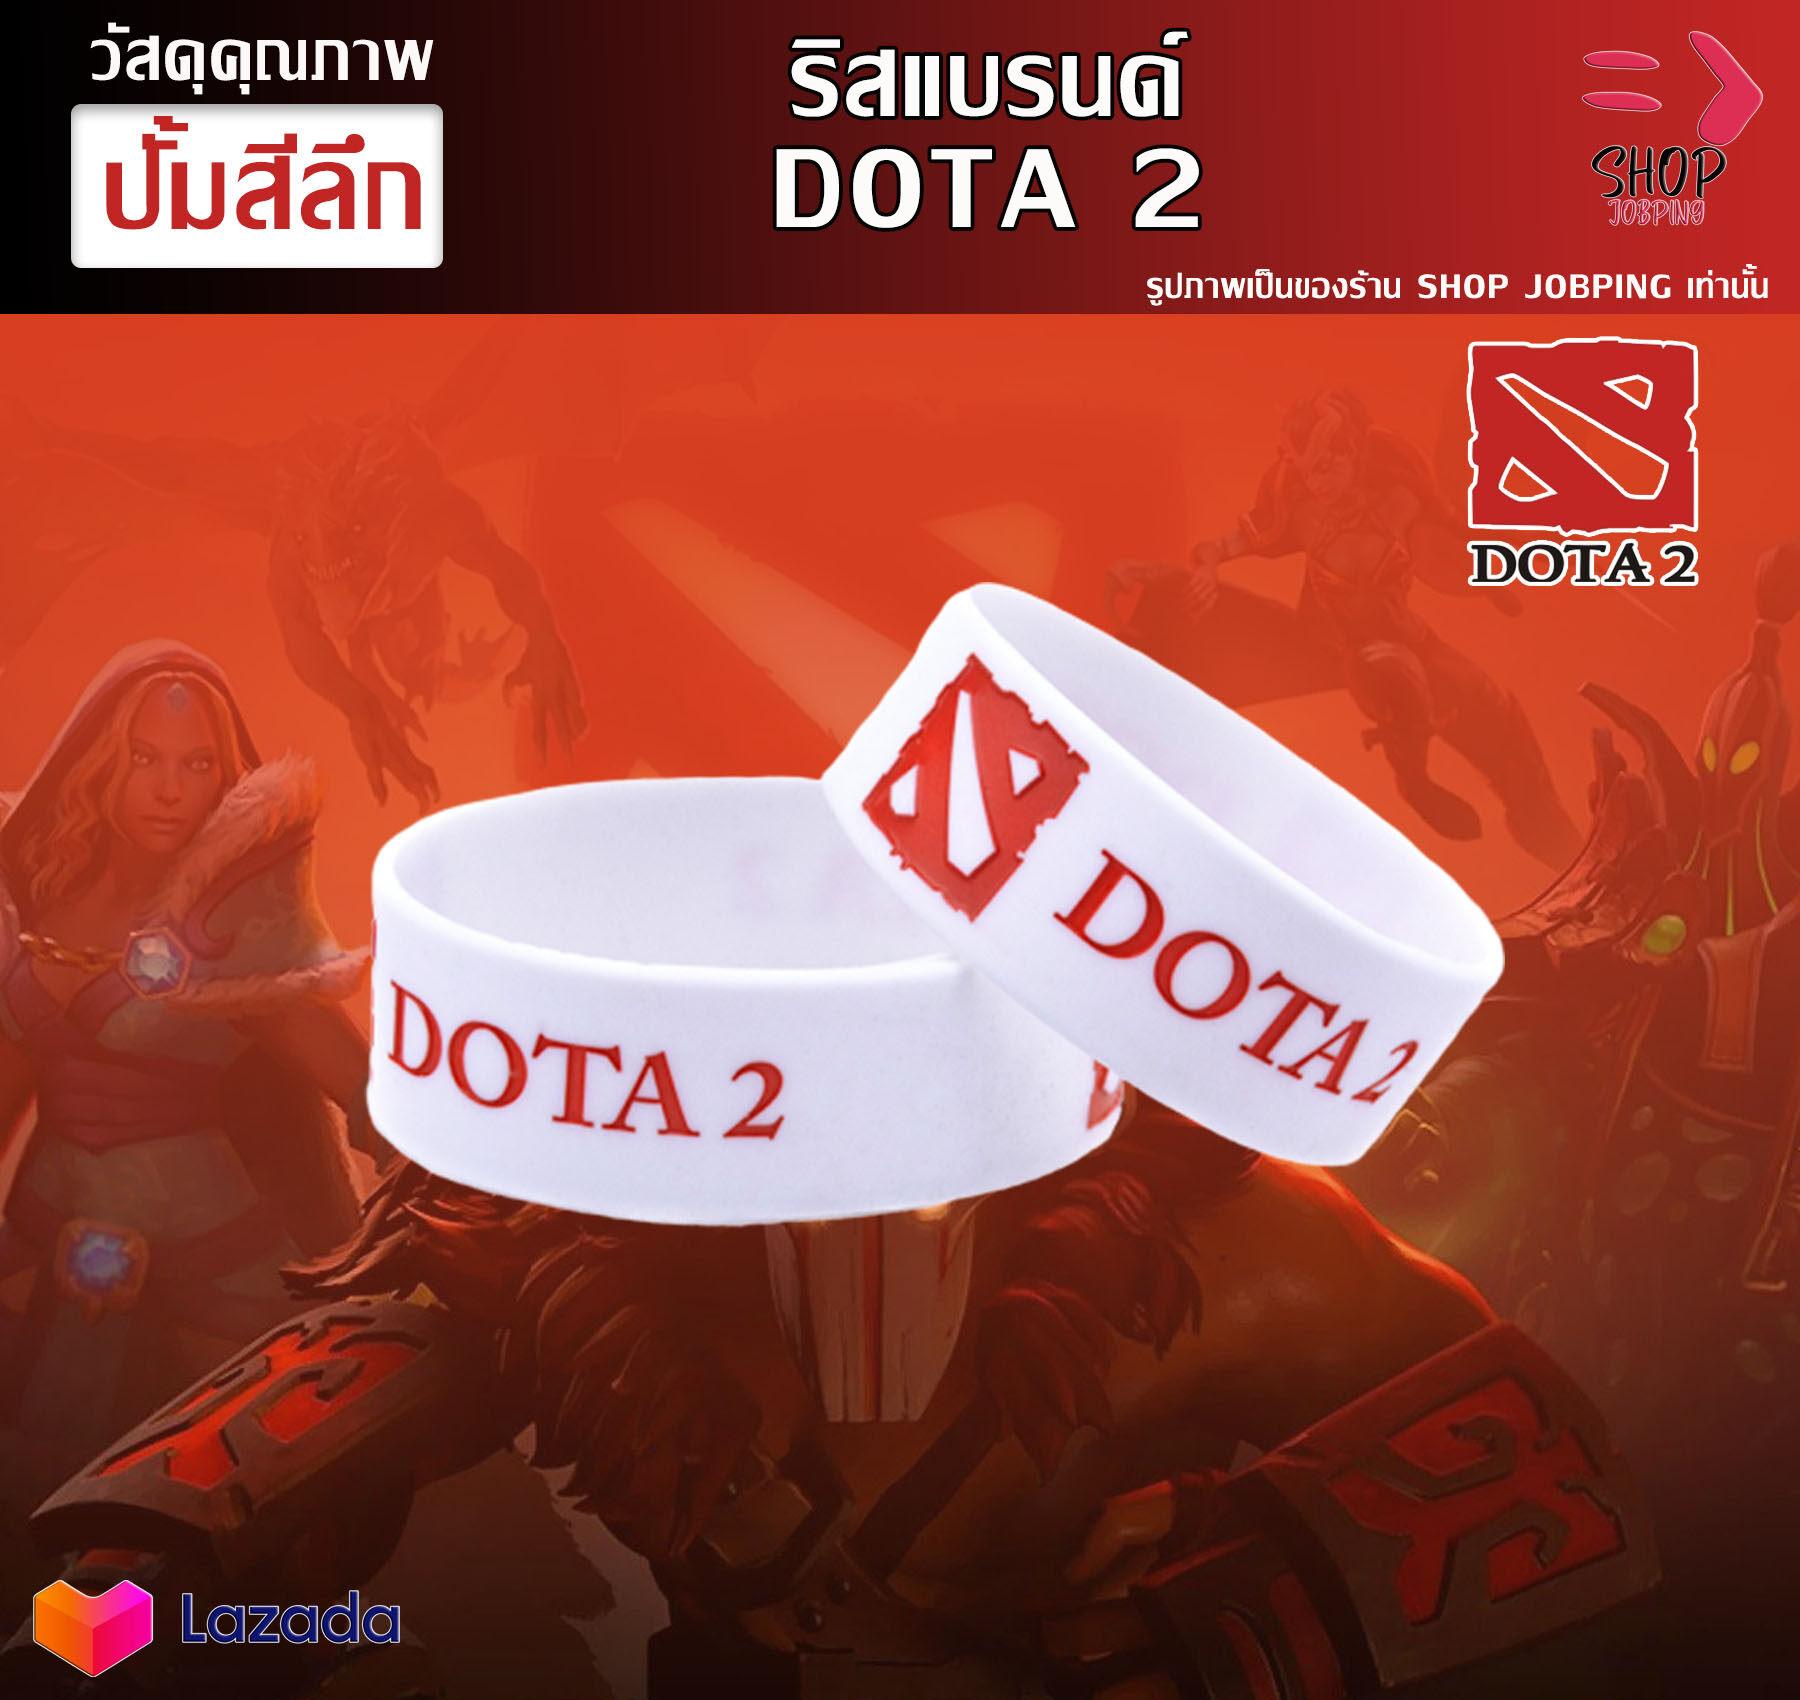 Dota2 ริสแบนด์ โดต้าทู ปั๊มลึกสีคมชัด ดอทเอสอง สายรัดข้อมือ Wristband ดอท Wristband เกมส์ ริสแบนด์เกมส์แนว Moba Dota2.